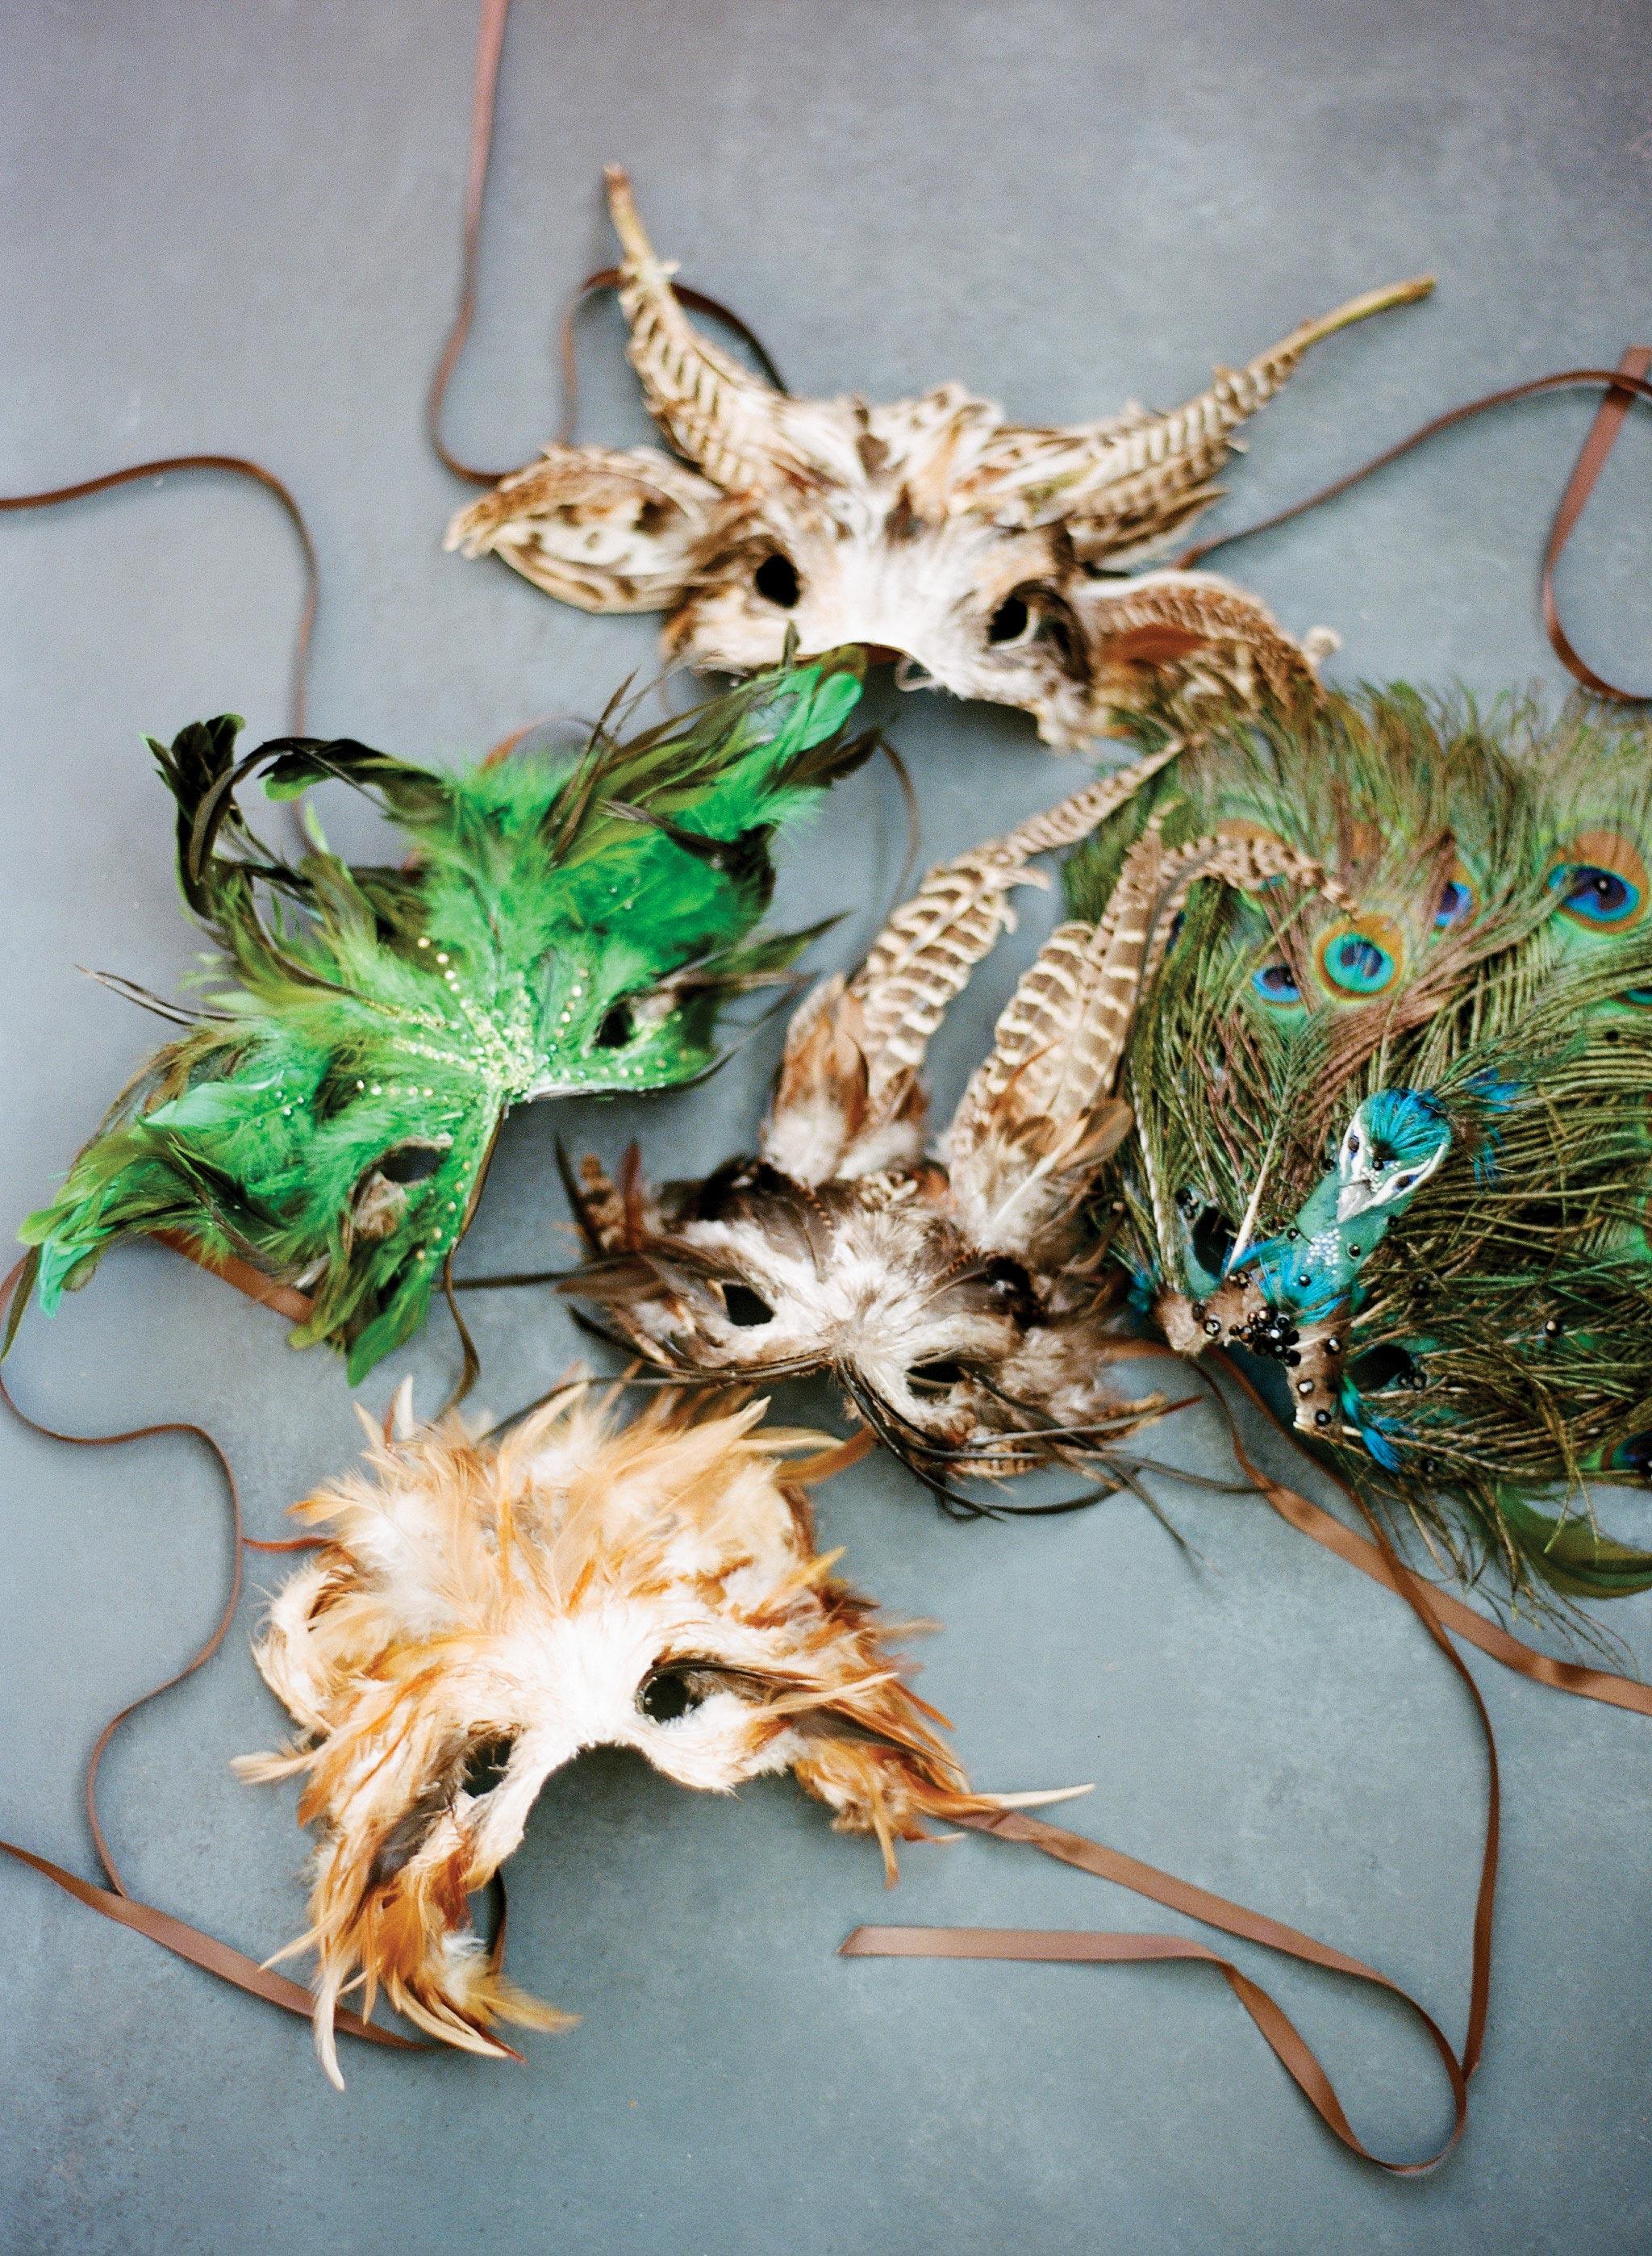 glara matthew wedding masks photo booth